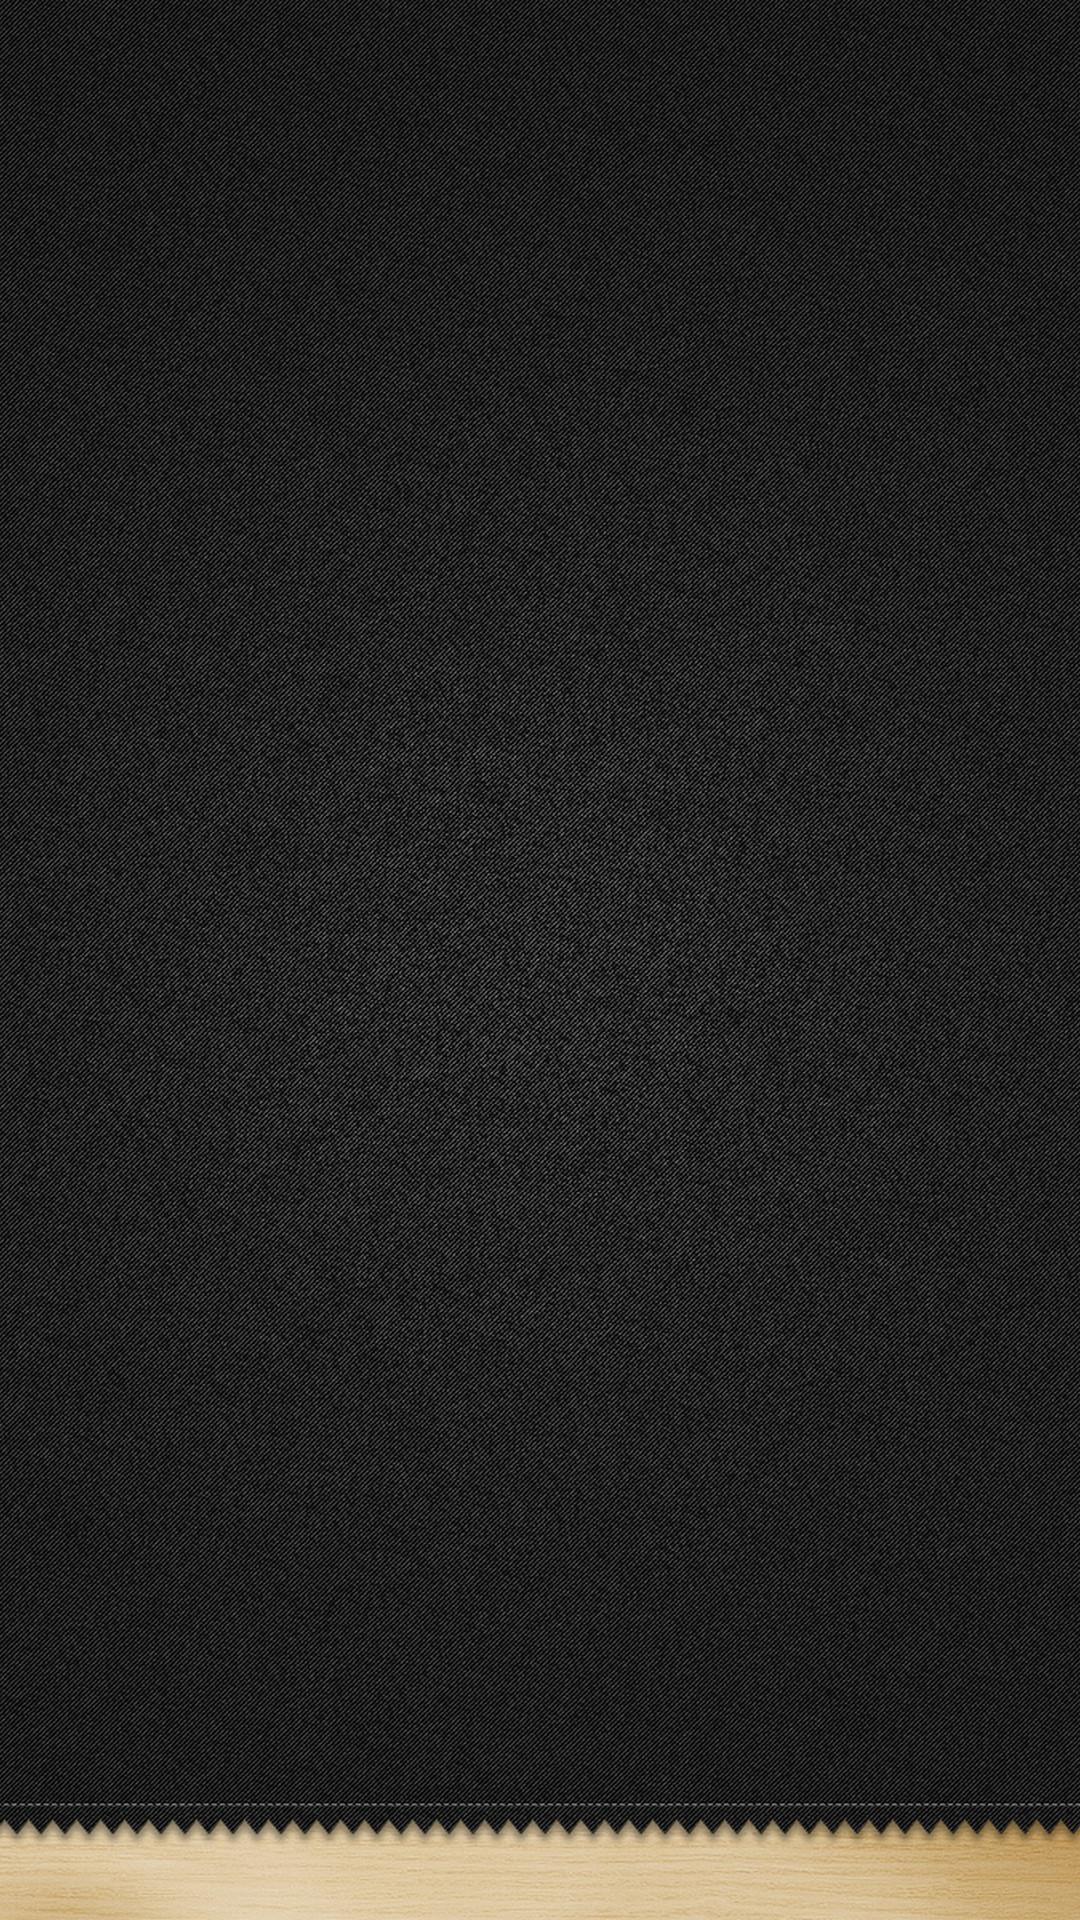 Res: 1080x1920, Clean Dark Denim Texture Android Wallpaper ...